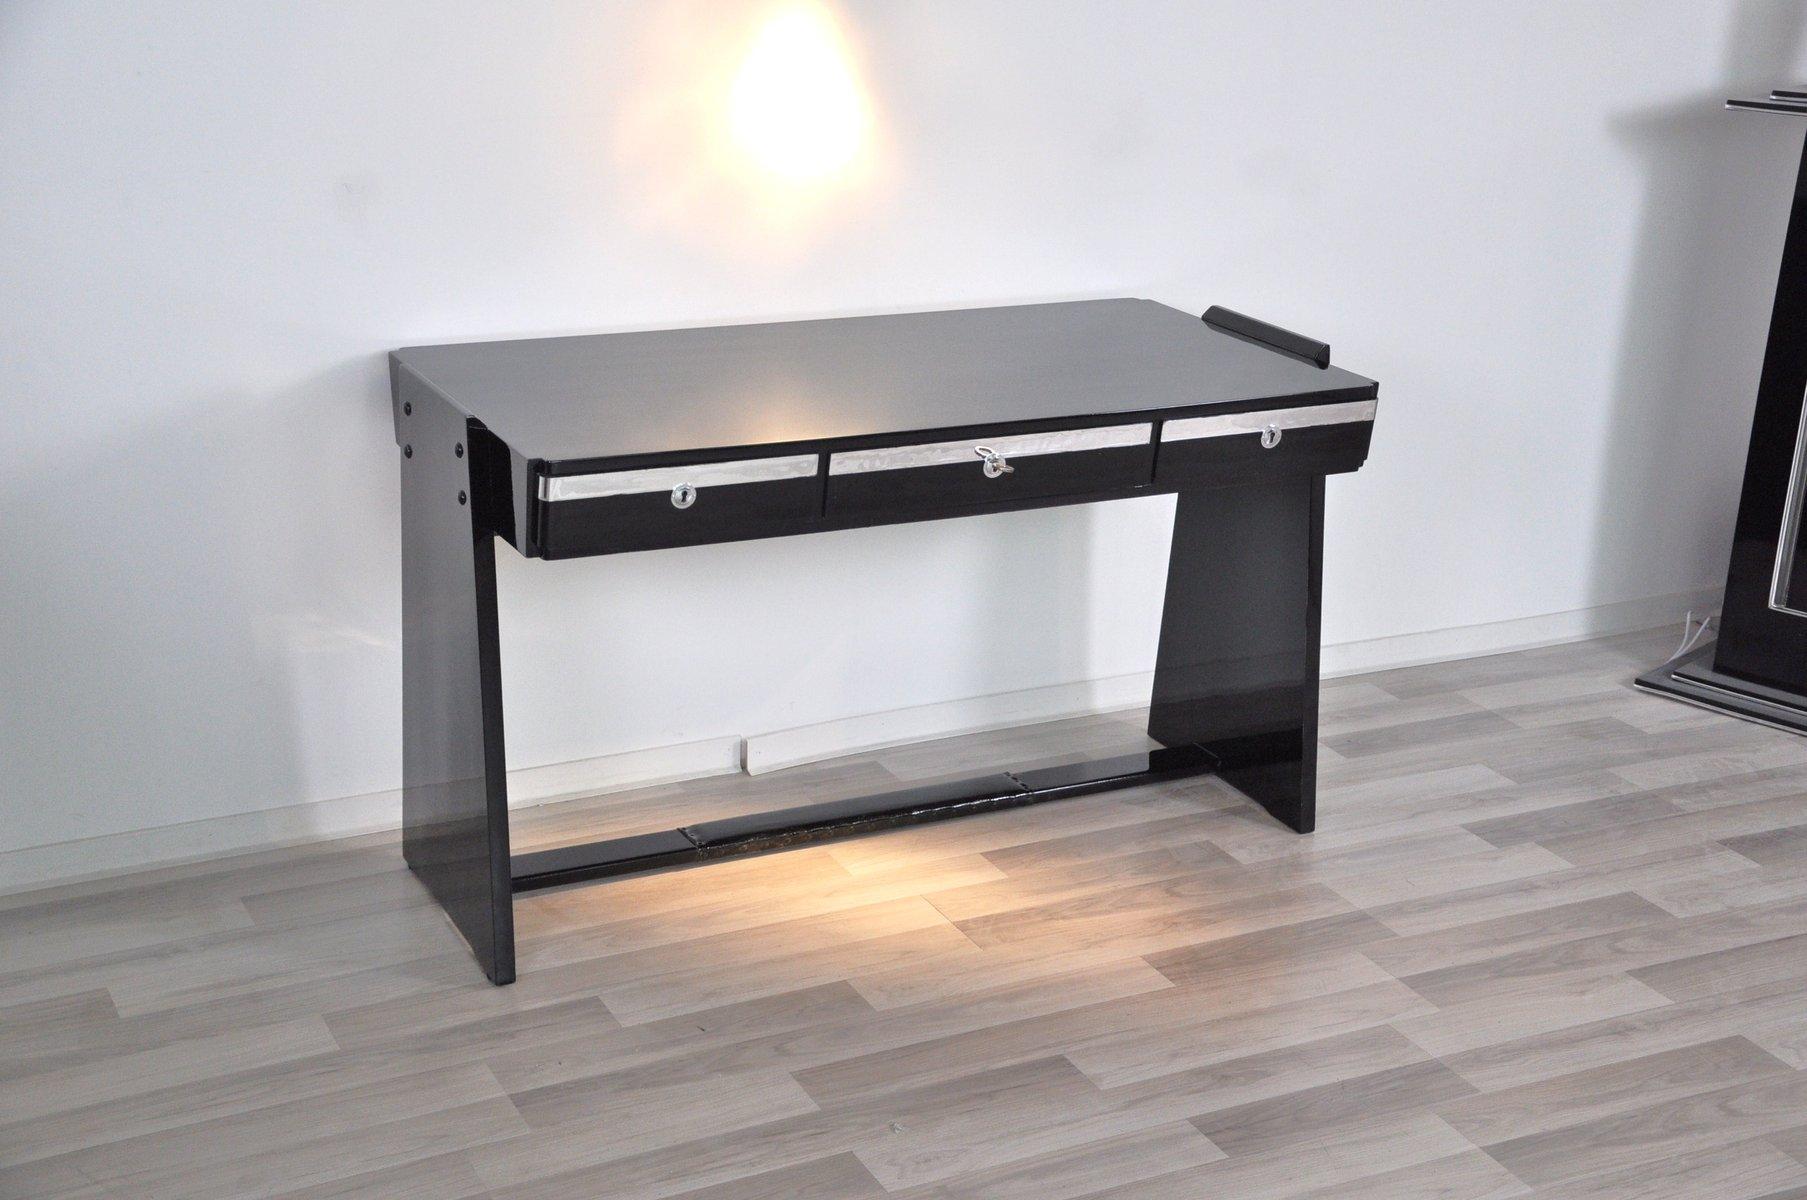 Bureau metal et verre noir ecosia